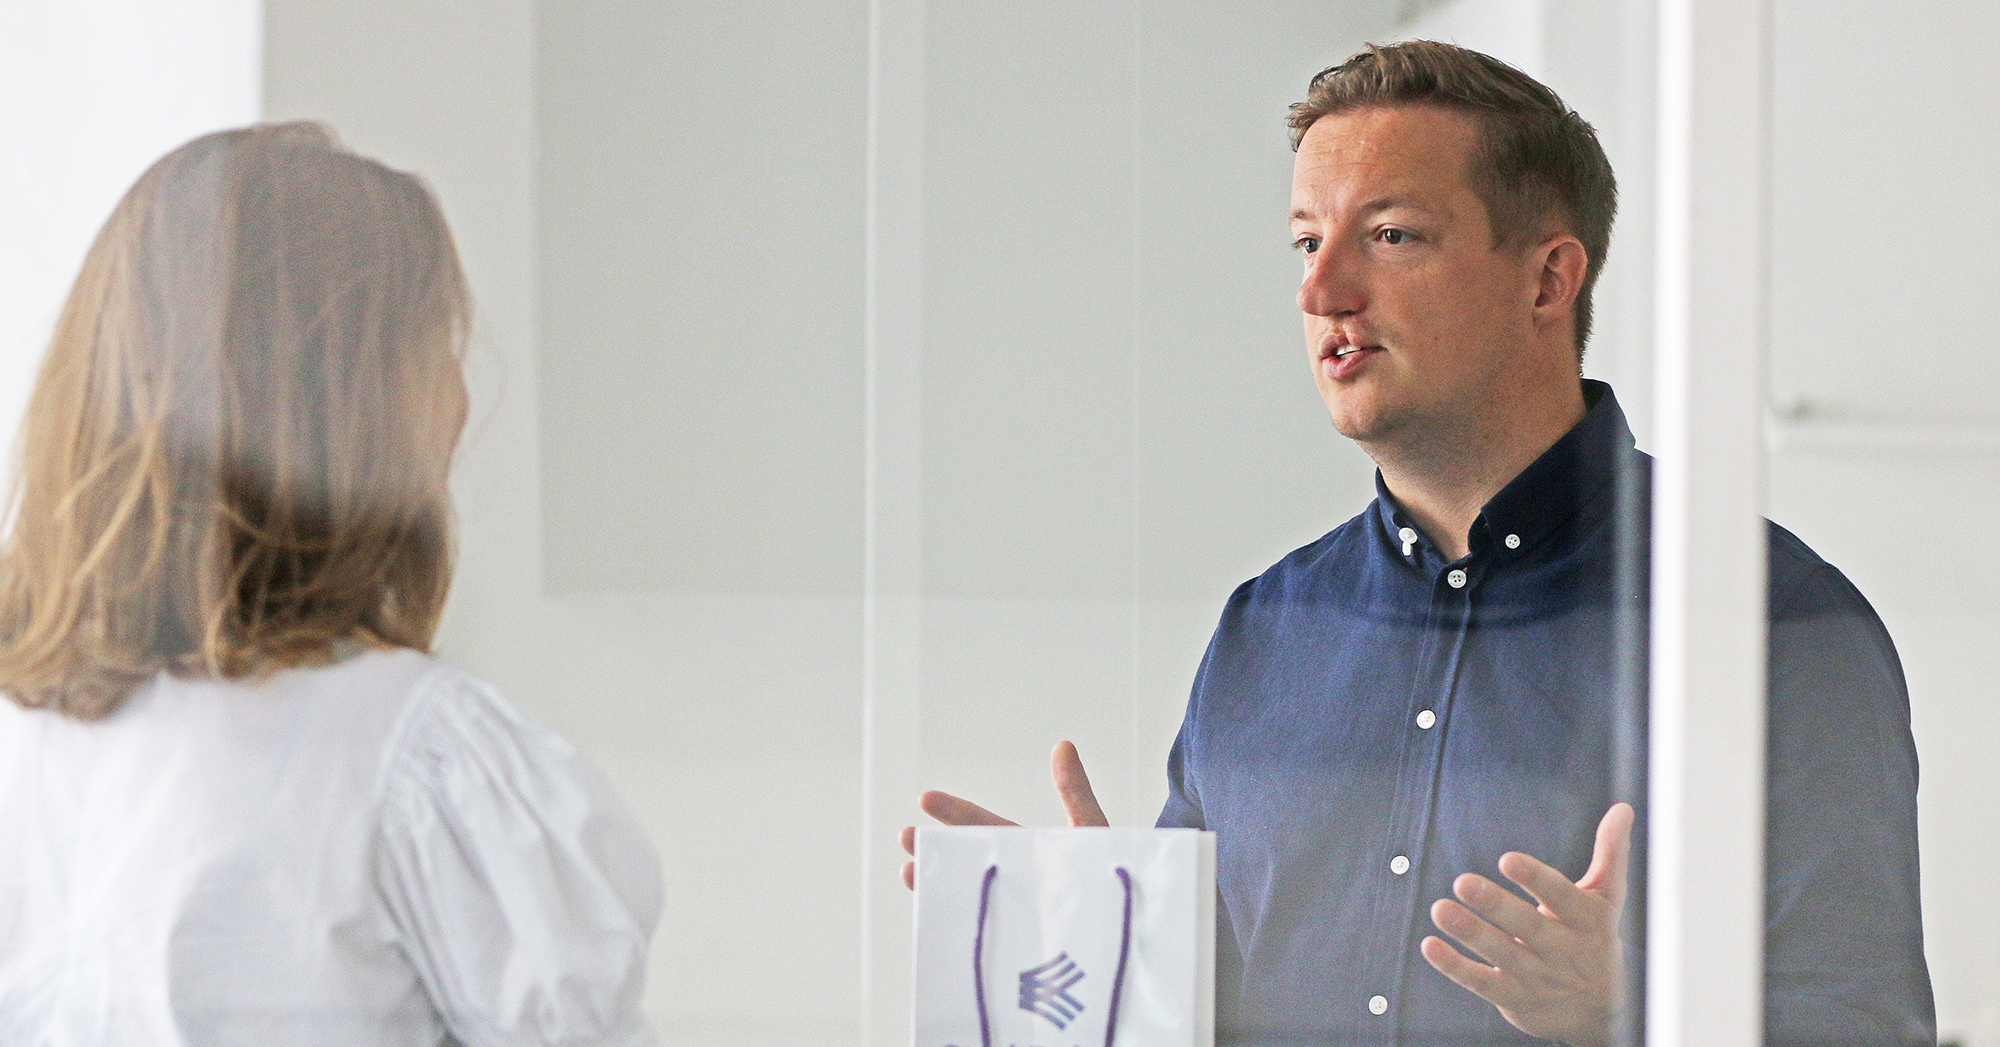 referenscase stark relation som beskriver Vass Kommunikation som en proffsig kommunikationsbyrå i Stockholm